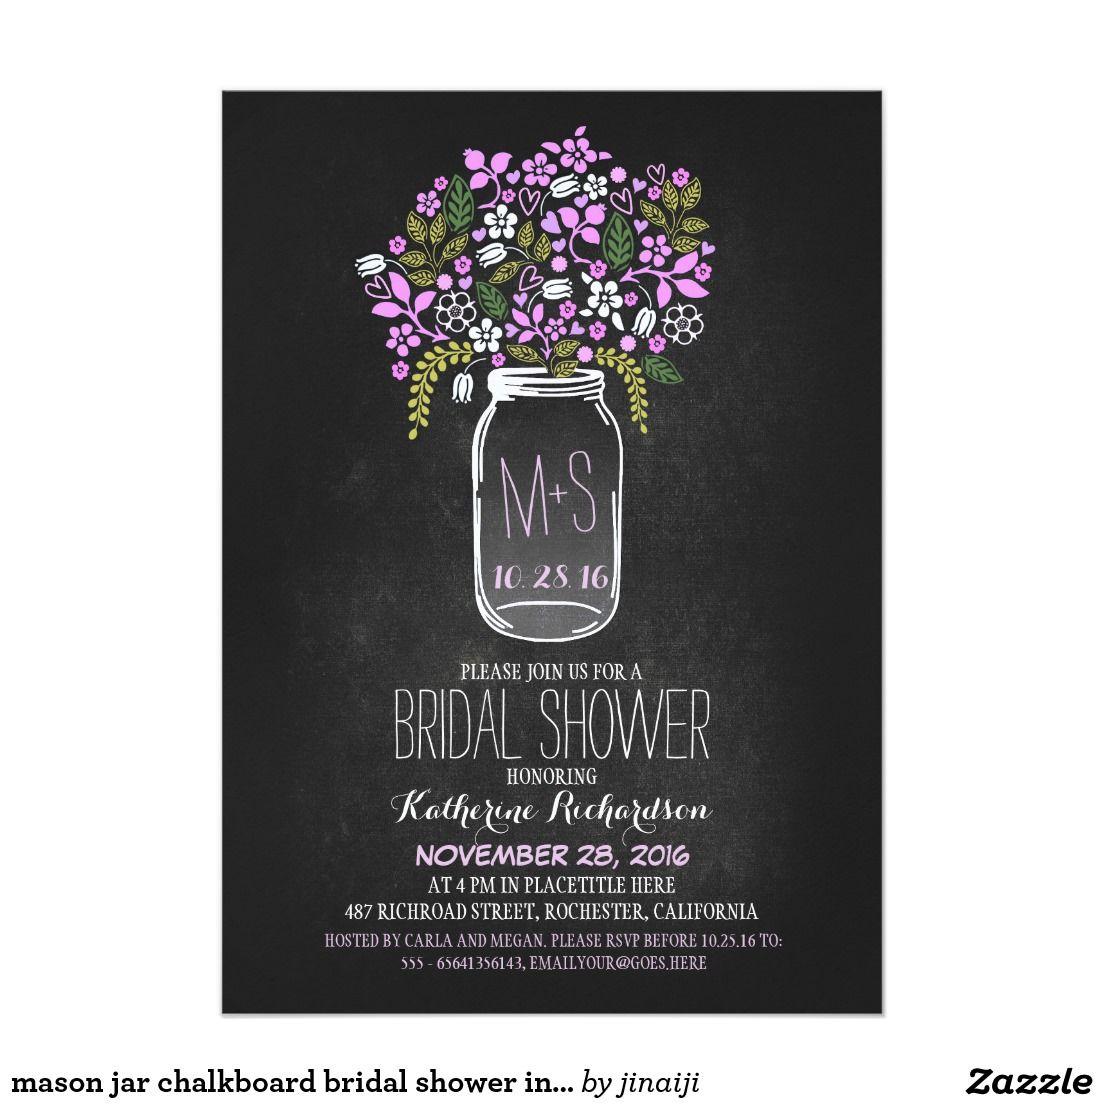 mason jar chalkboard bridal shower invitation. Elegant Chalkboard ...